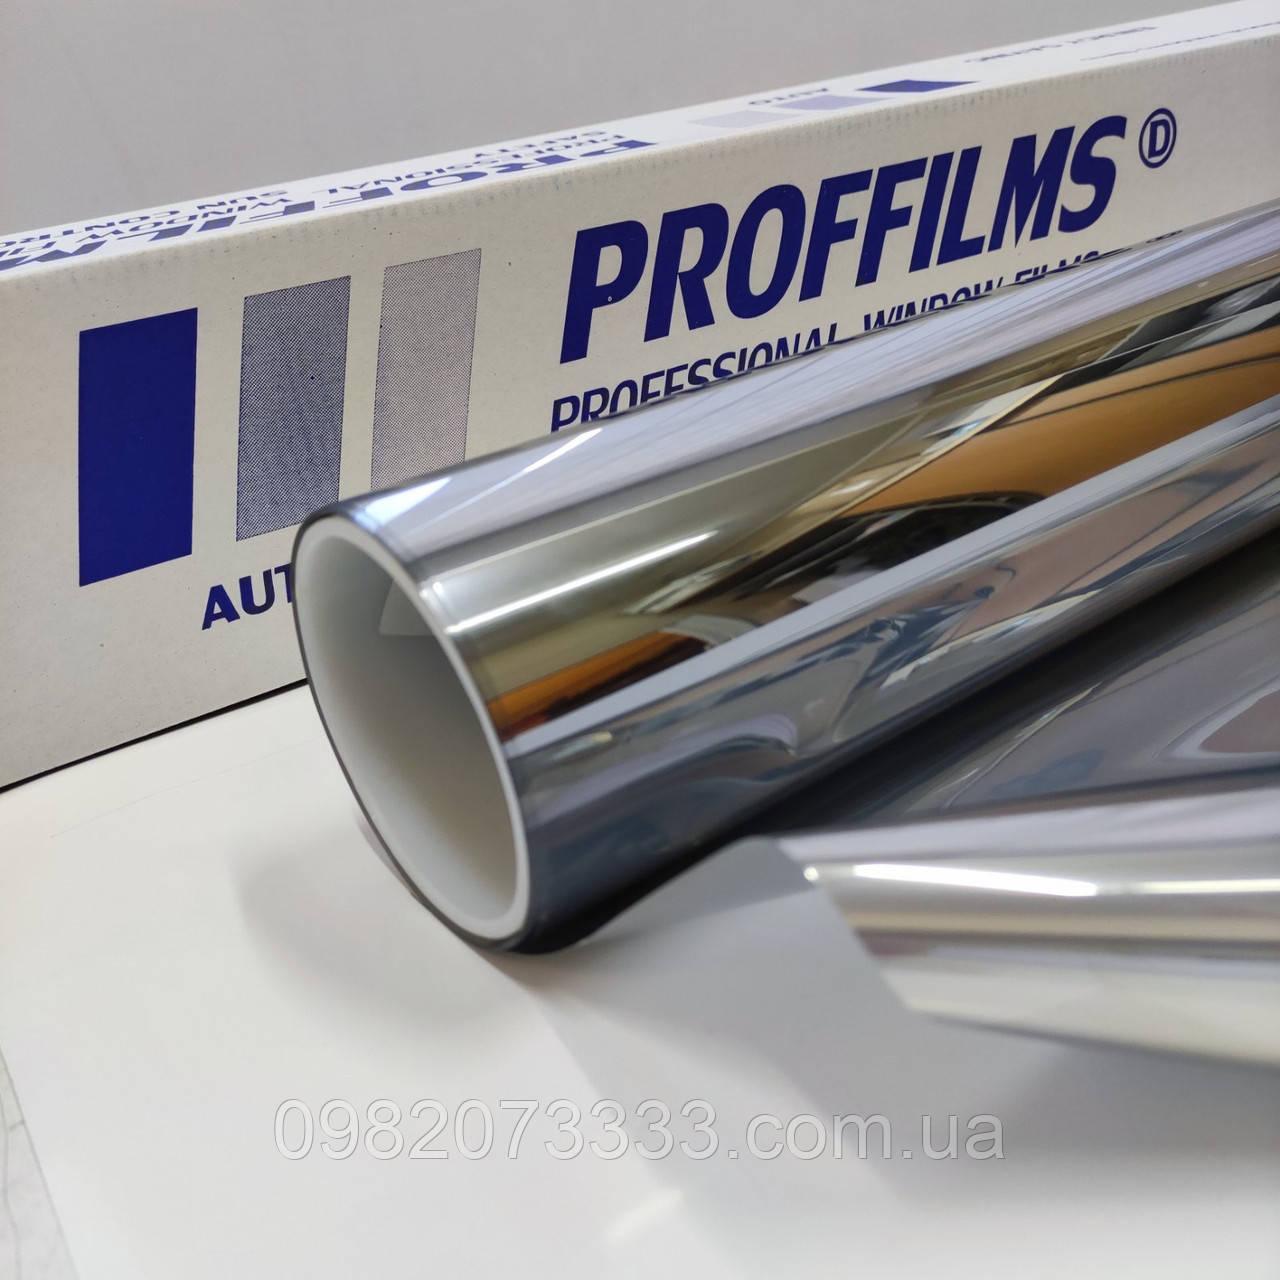 Солнцезащитная плёнка PROFFILMS Silver 35 зеркальная для тонировки окон ширина рулона 1,830 цена за кв.м.